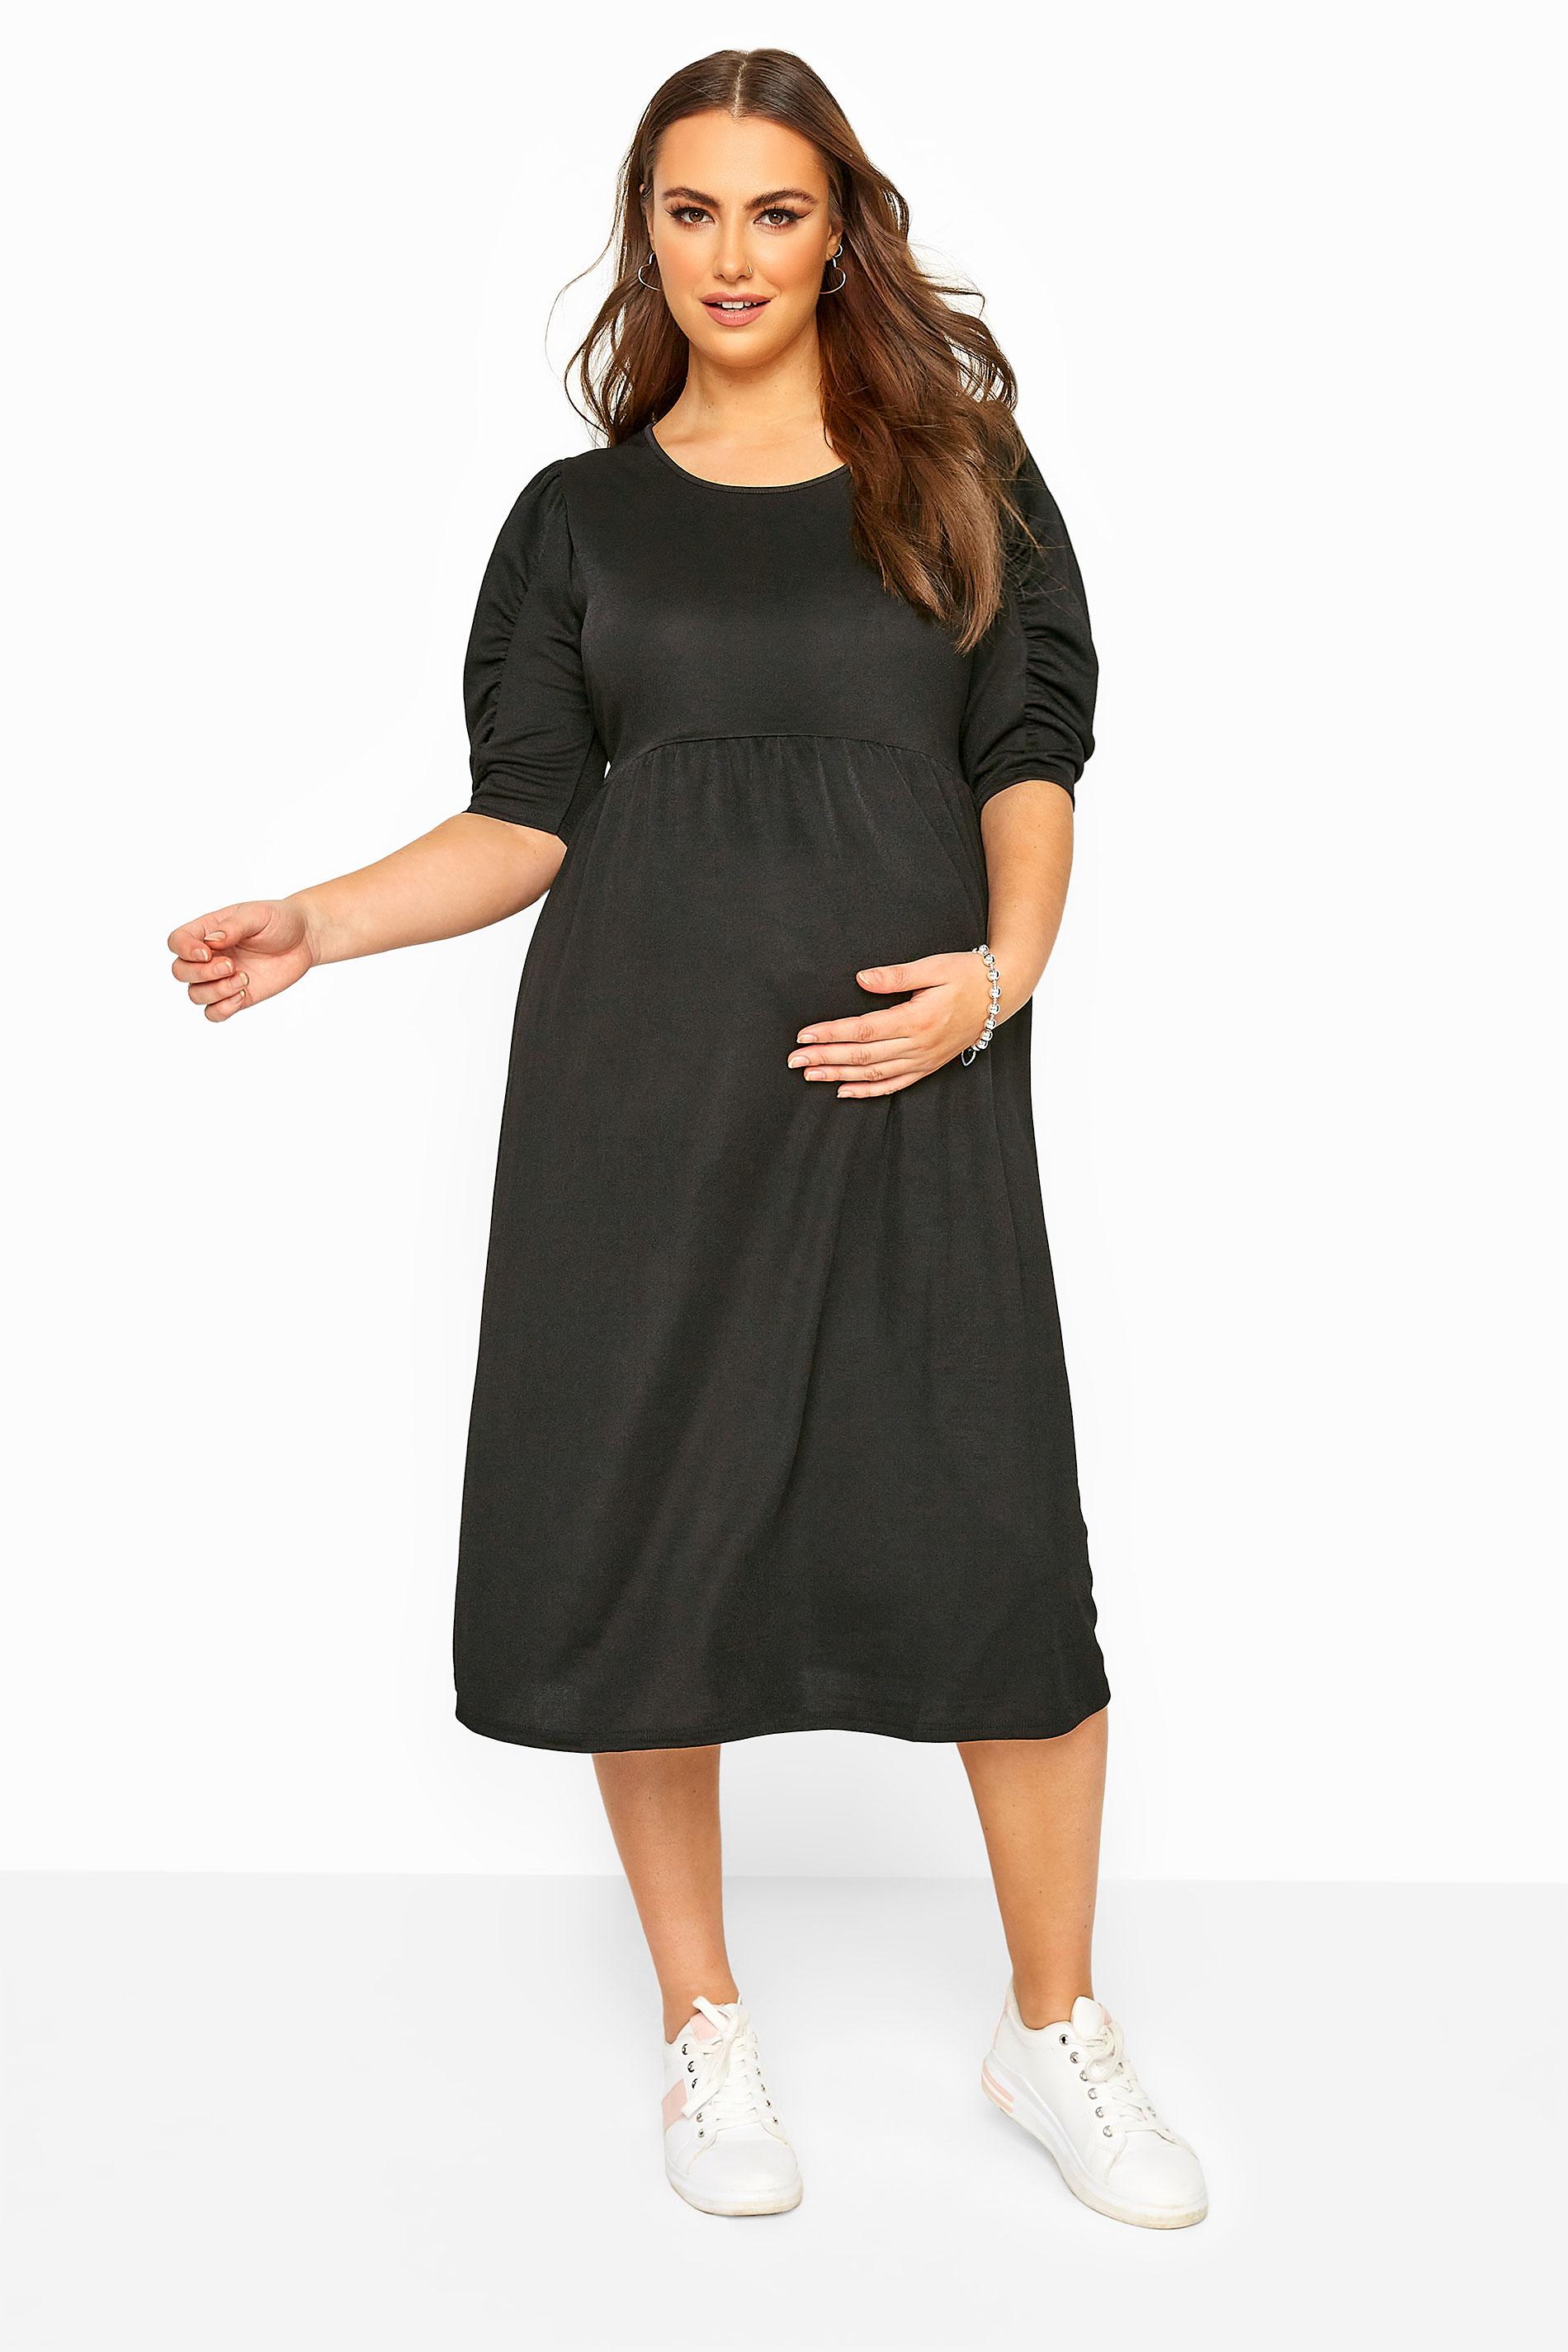 BUMP IT UP MATERNITY Black Jersey Smock Midi Dress